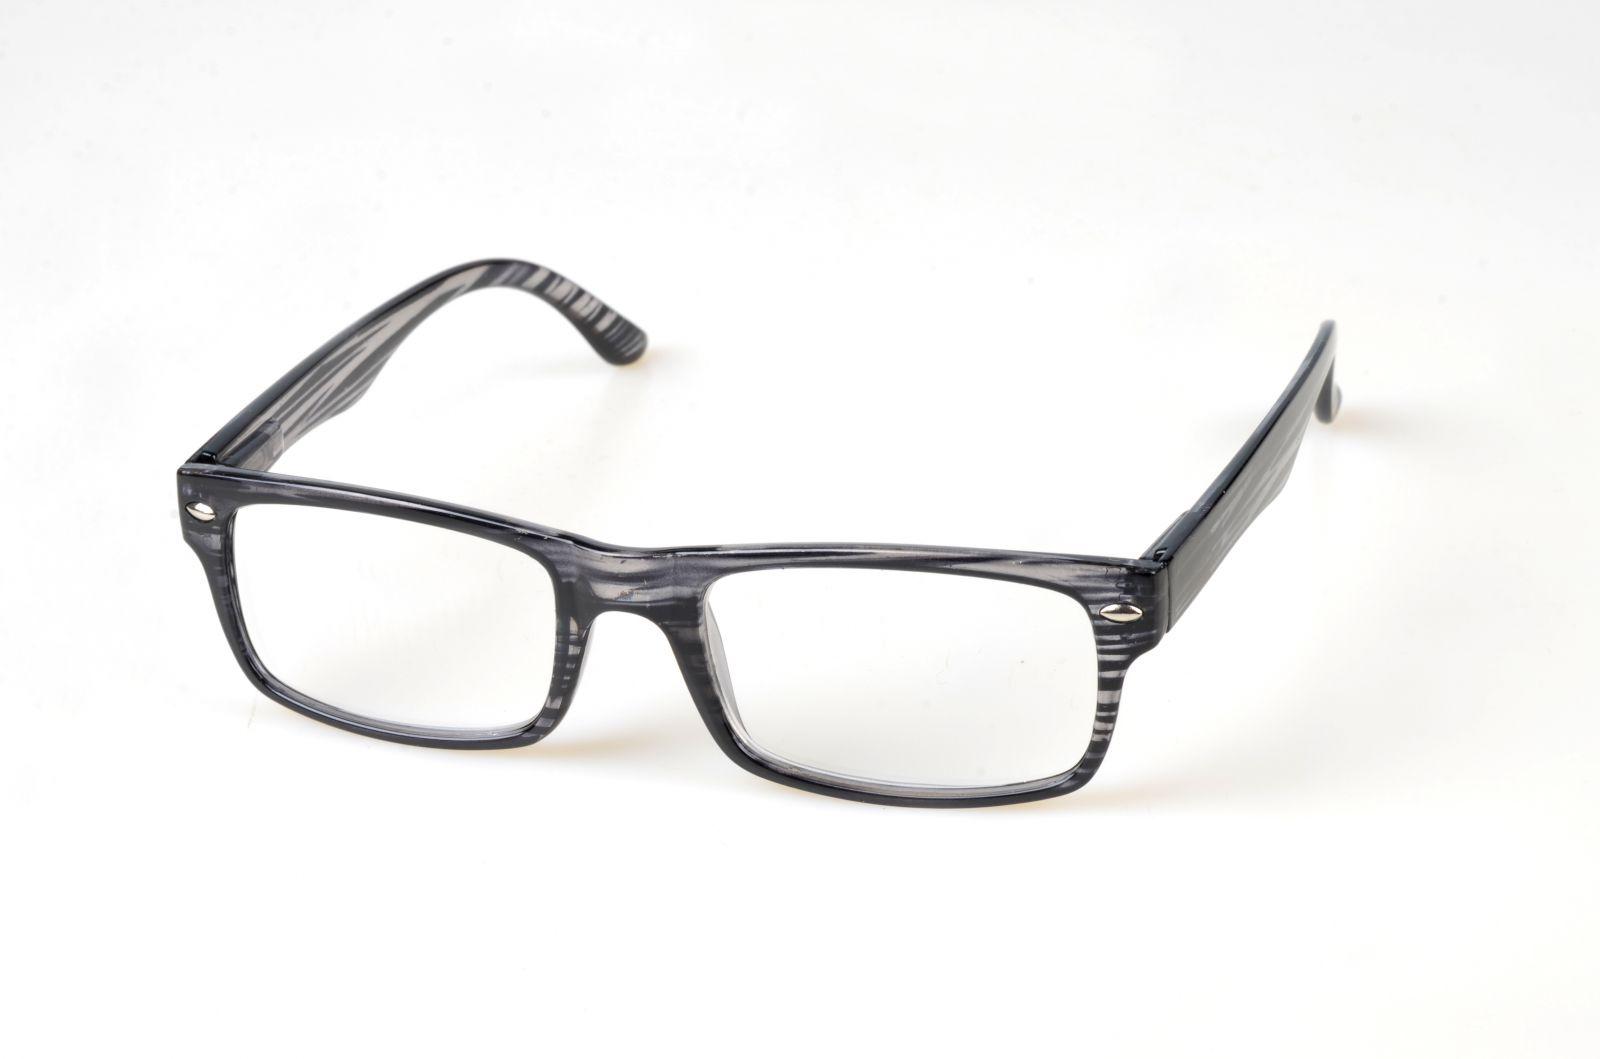 Dioptrické brýle R1101111 +1,00 E-batoh